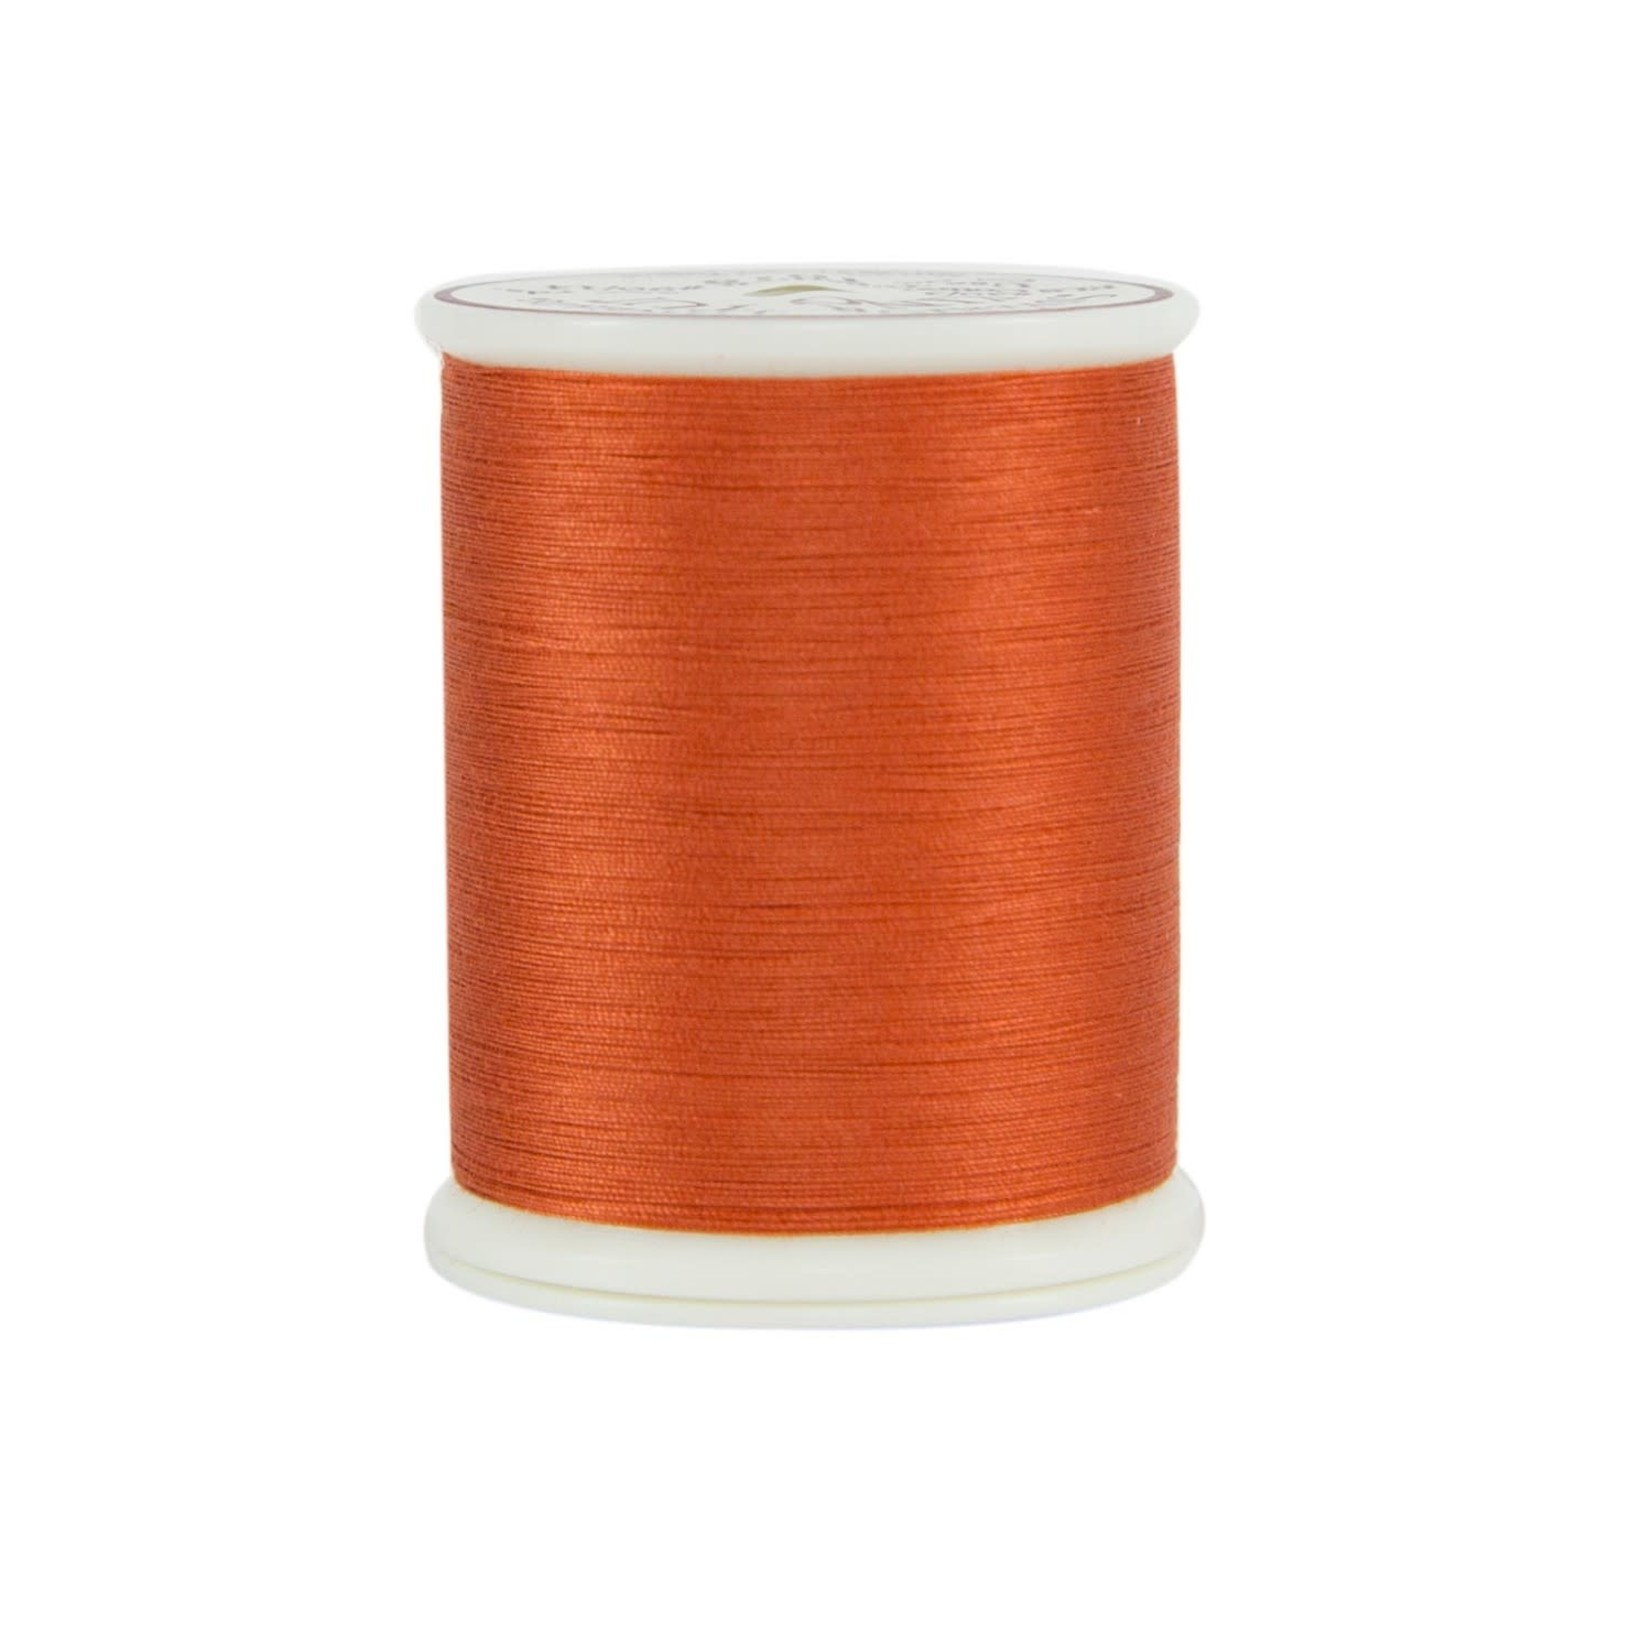 Superior Threads King Tut - #40 - 457 m - 1015 Irish Setter